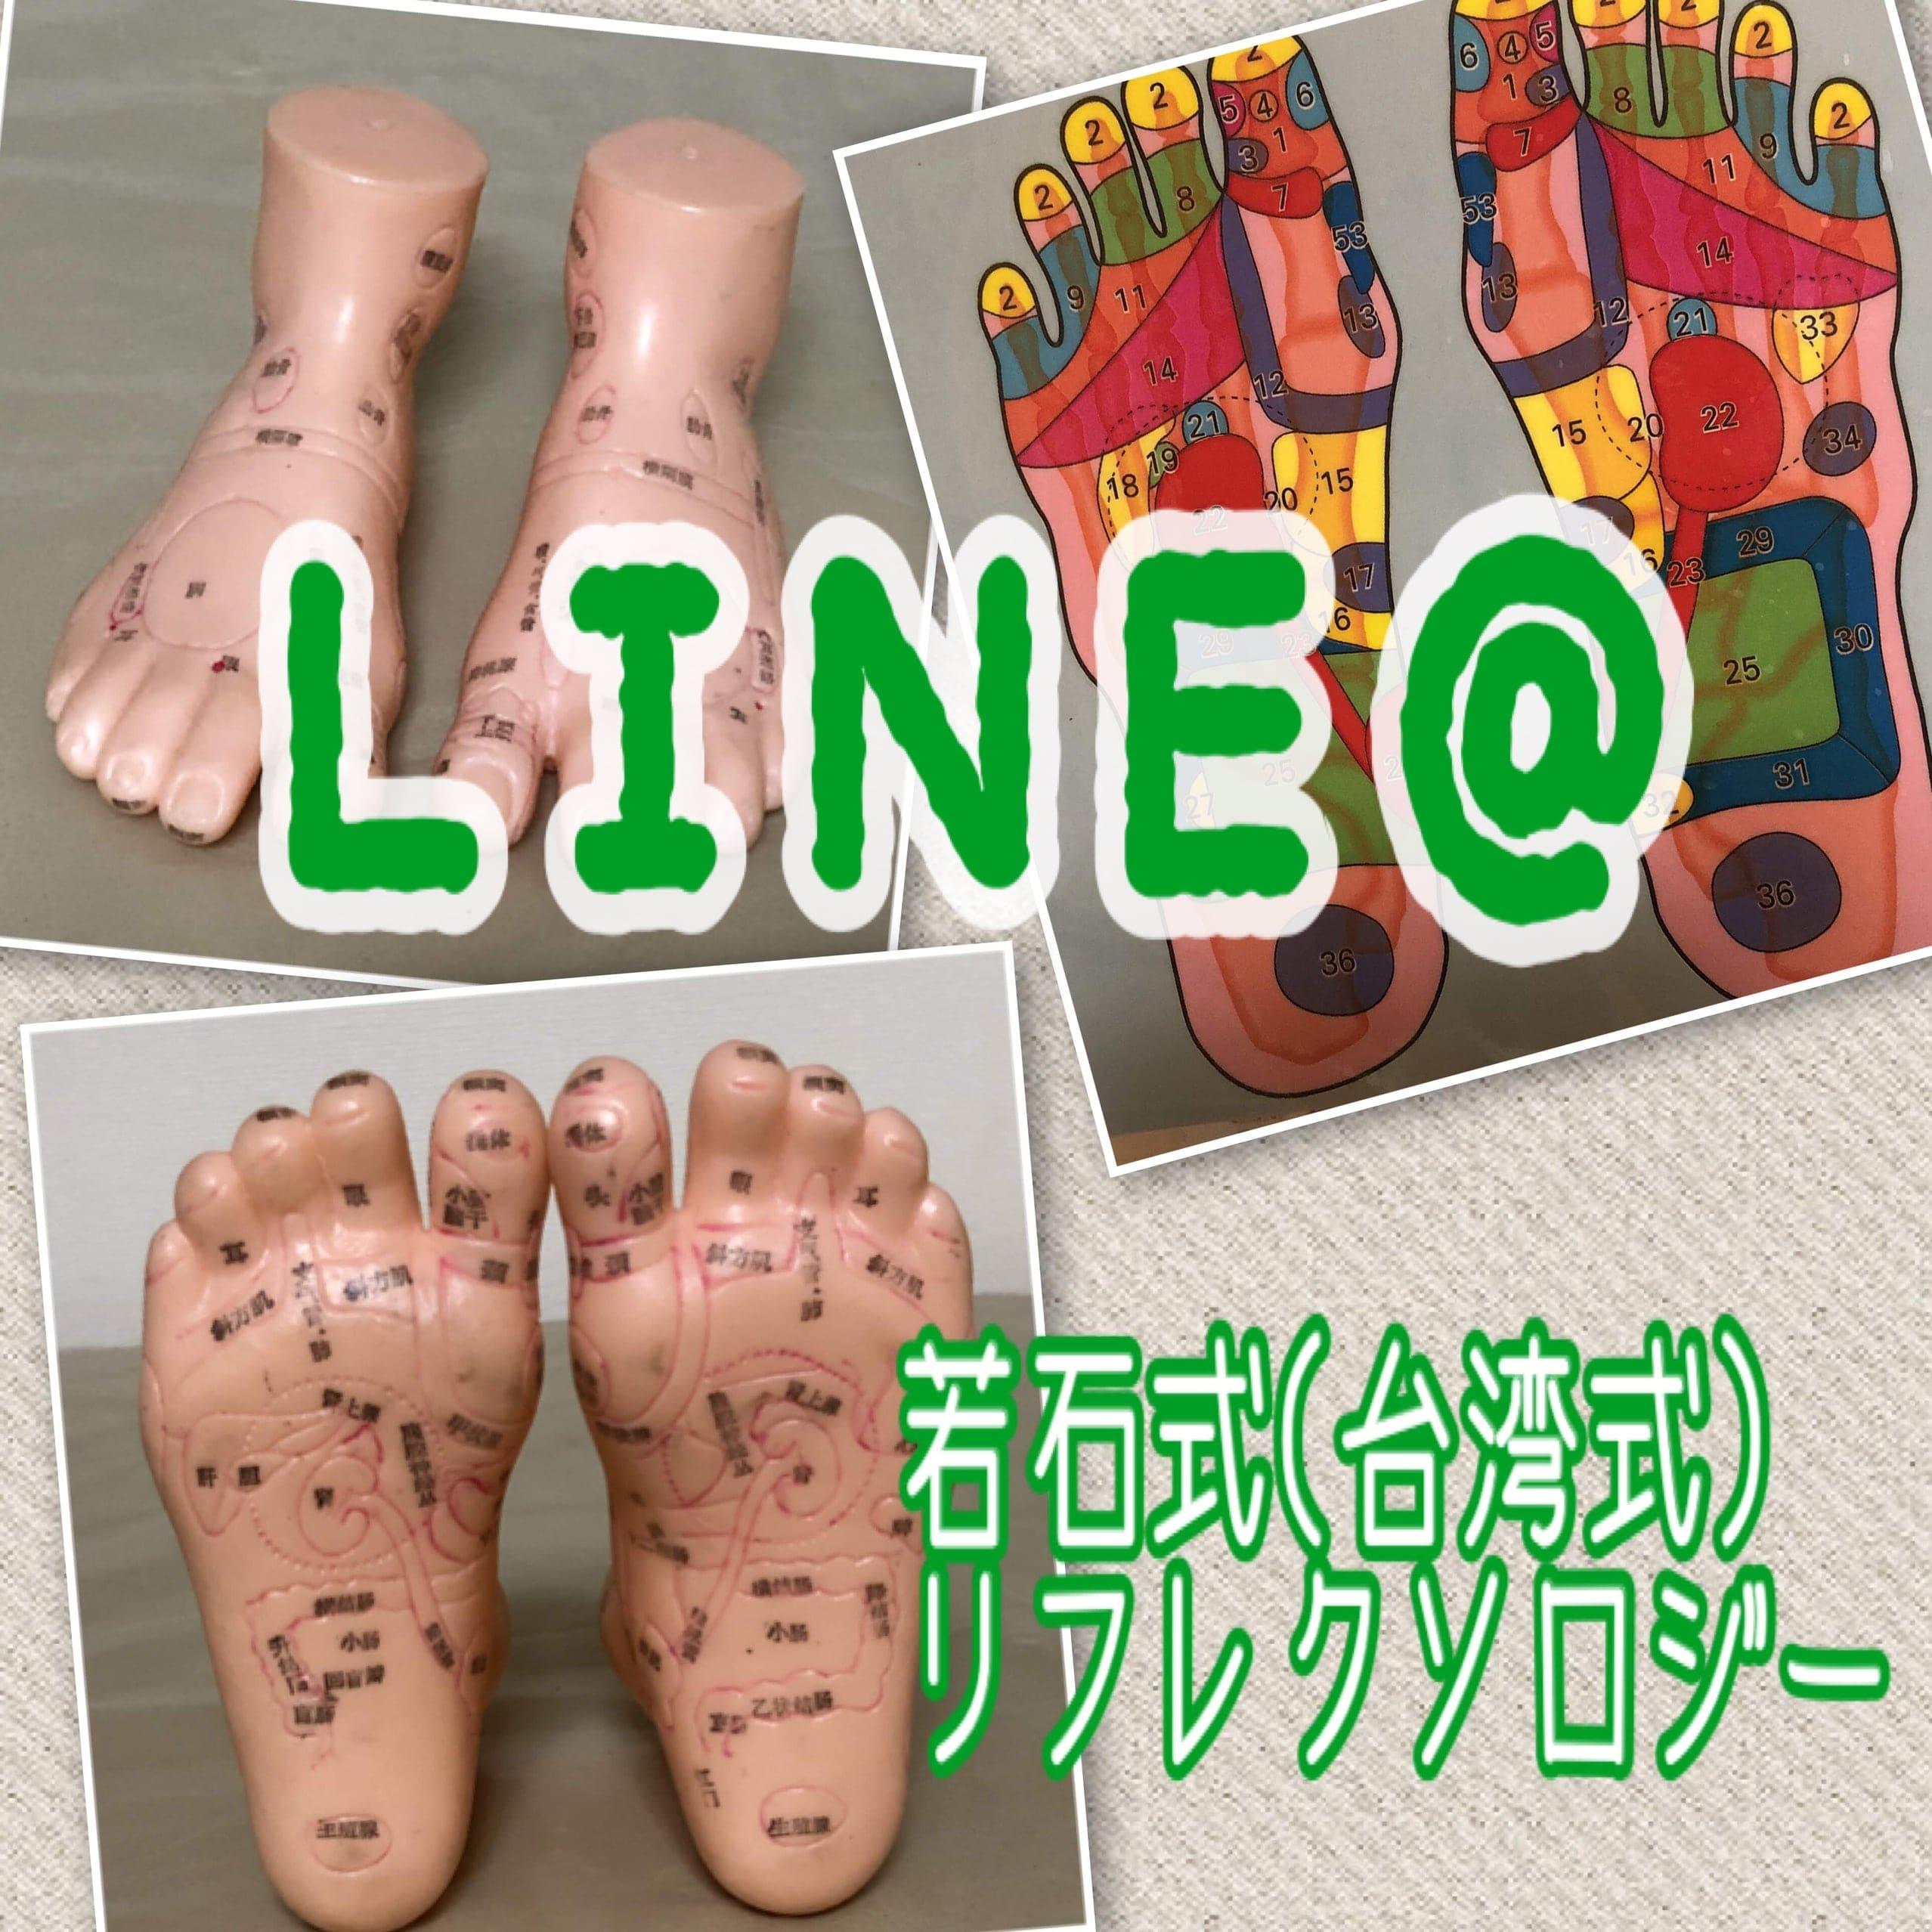 LINE@お友達初回限定キャンペーン・若石式(台湾式)足もみのイメージその1